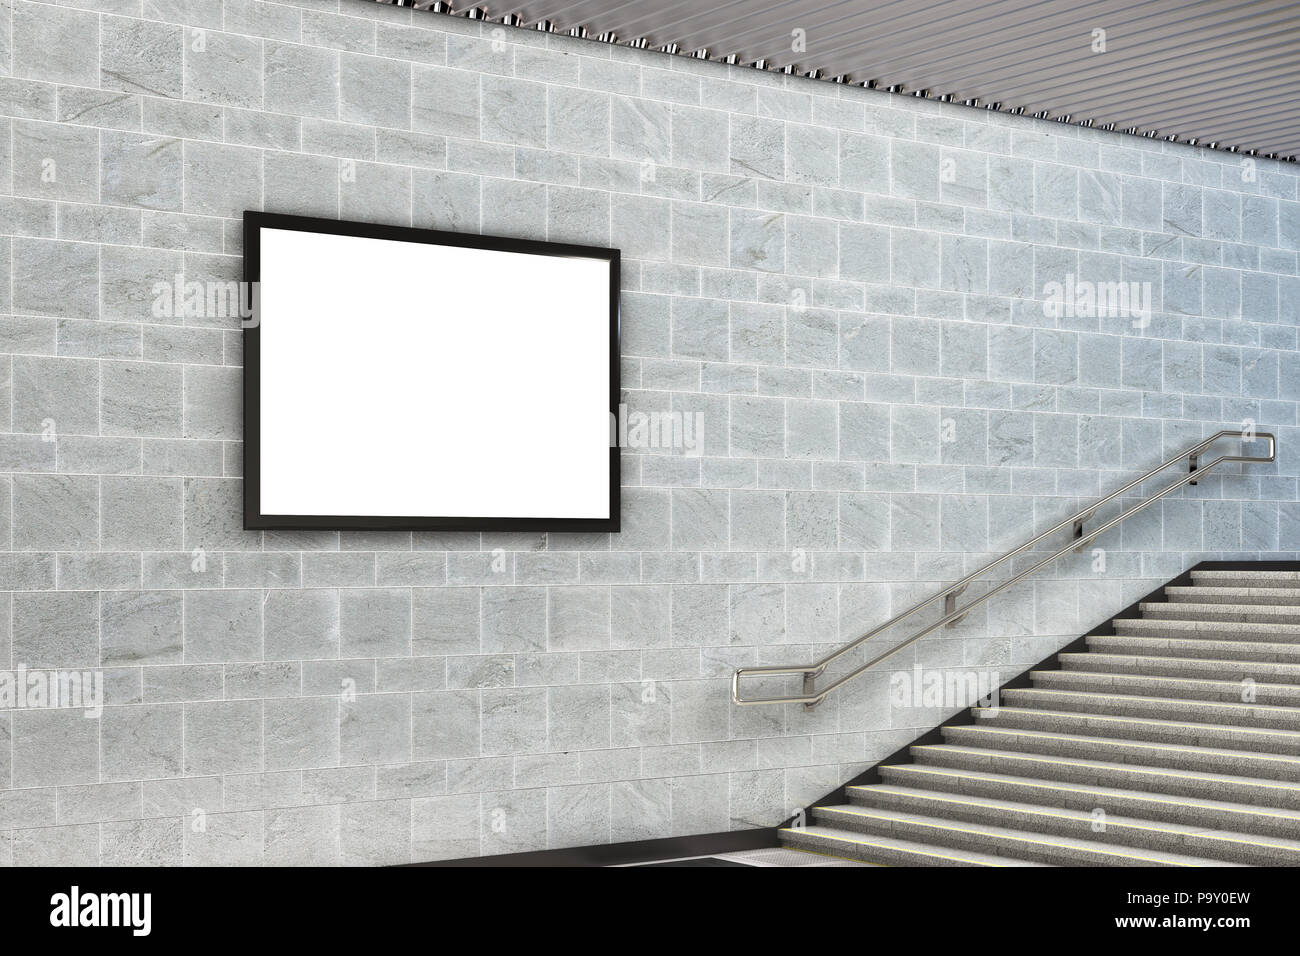 Blank horizontal advertising billboard poster underground. 3d illustration - Stock Image